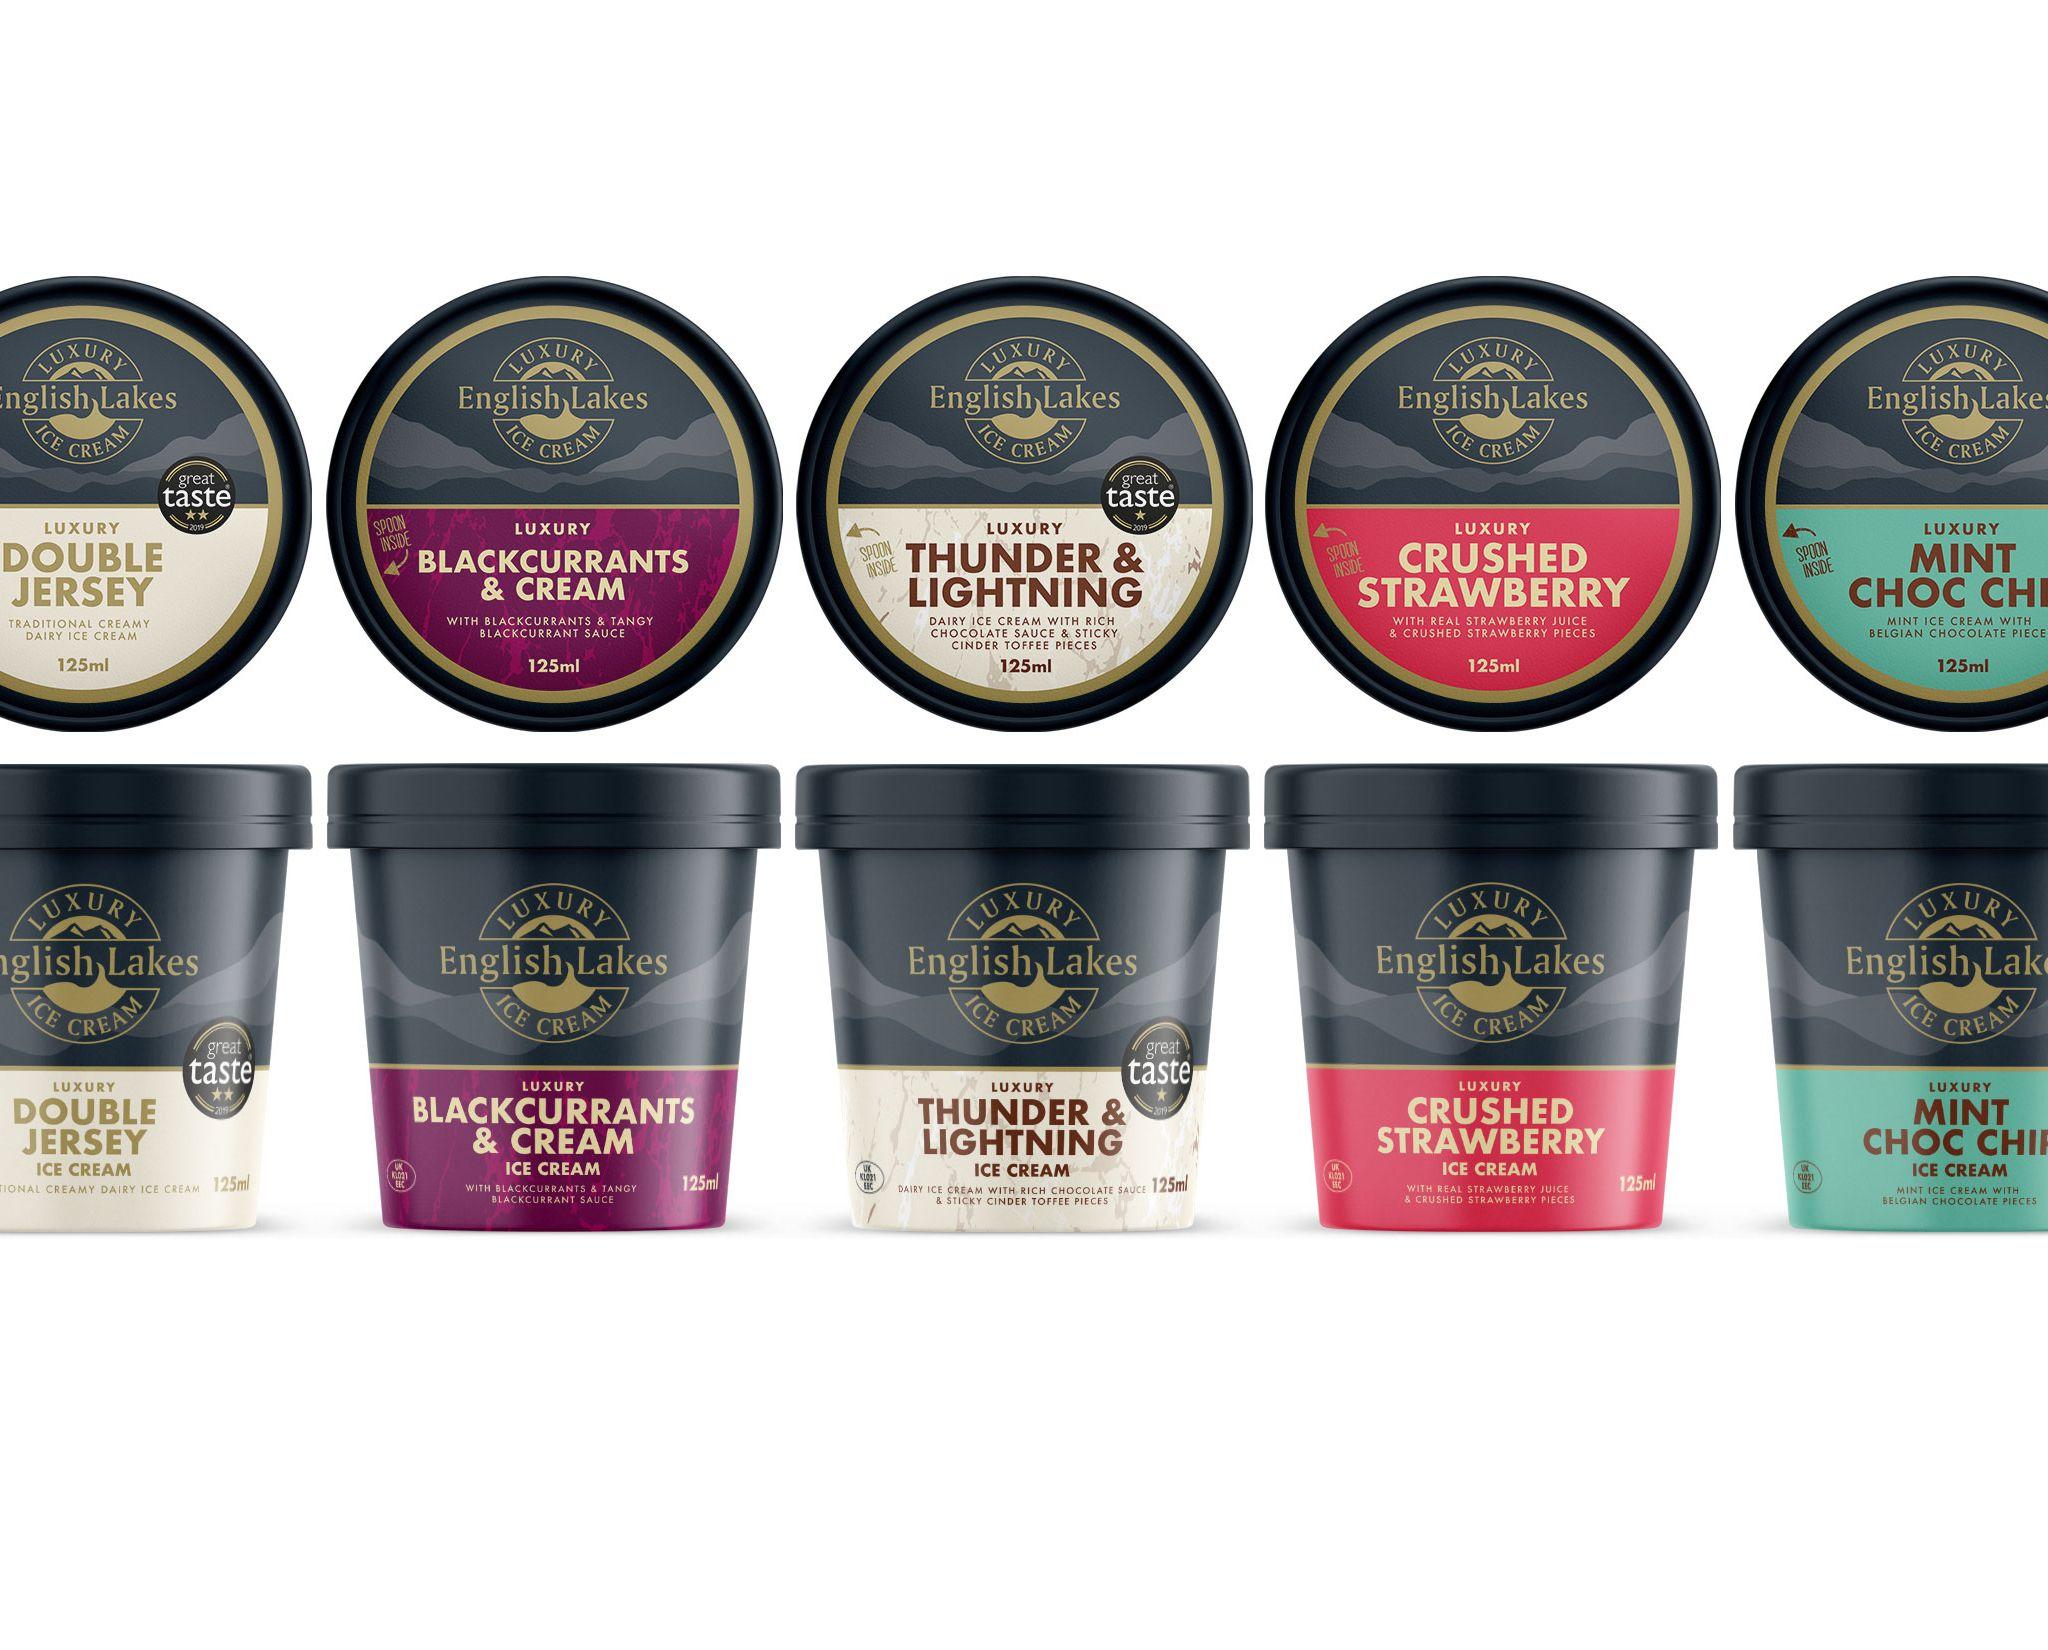 English Lakes Ice Cream Packaging Design